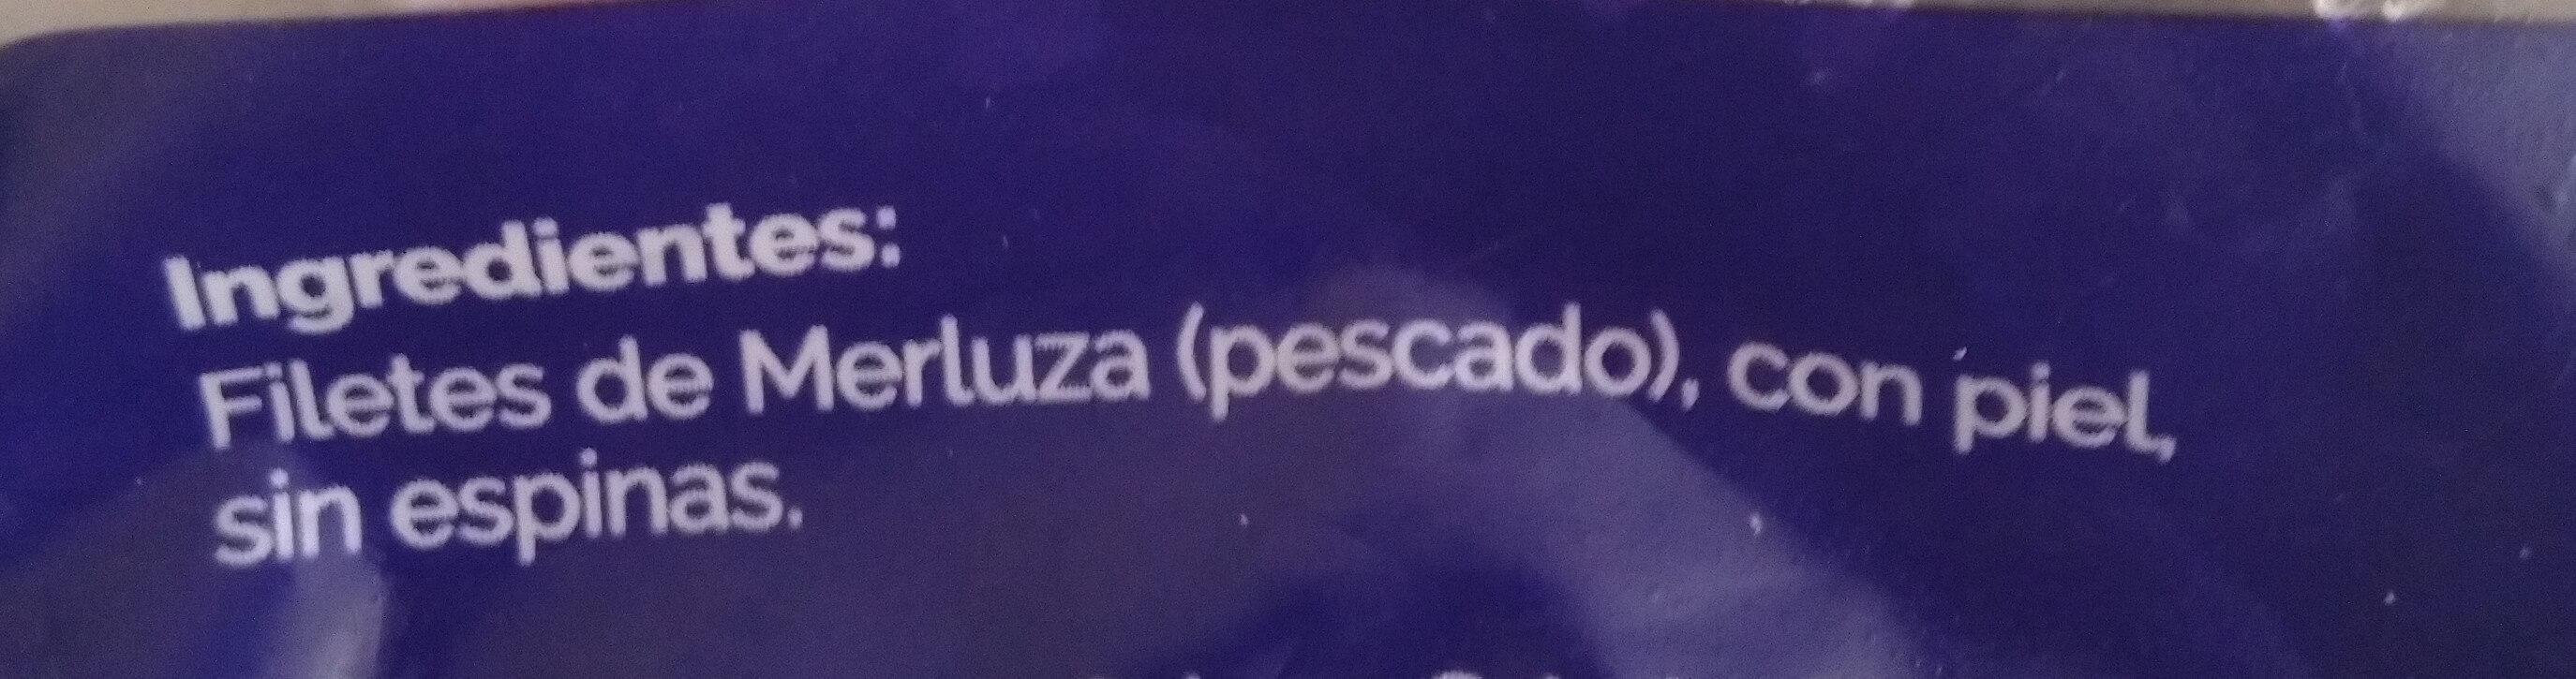 Filetes de merluza - Ingredients - es